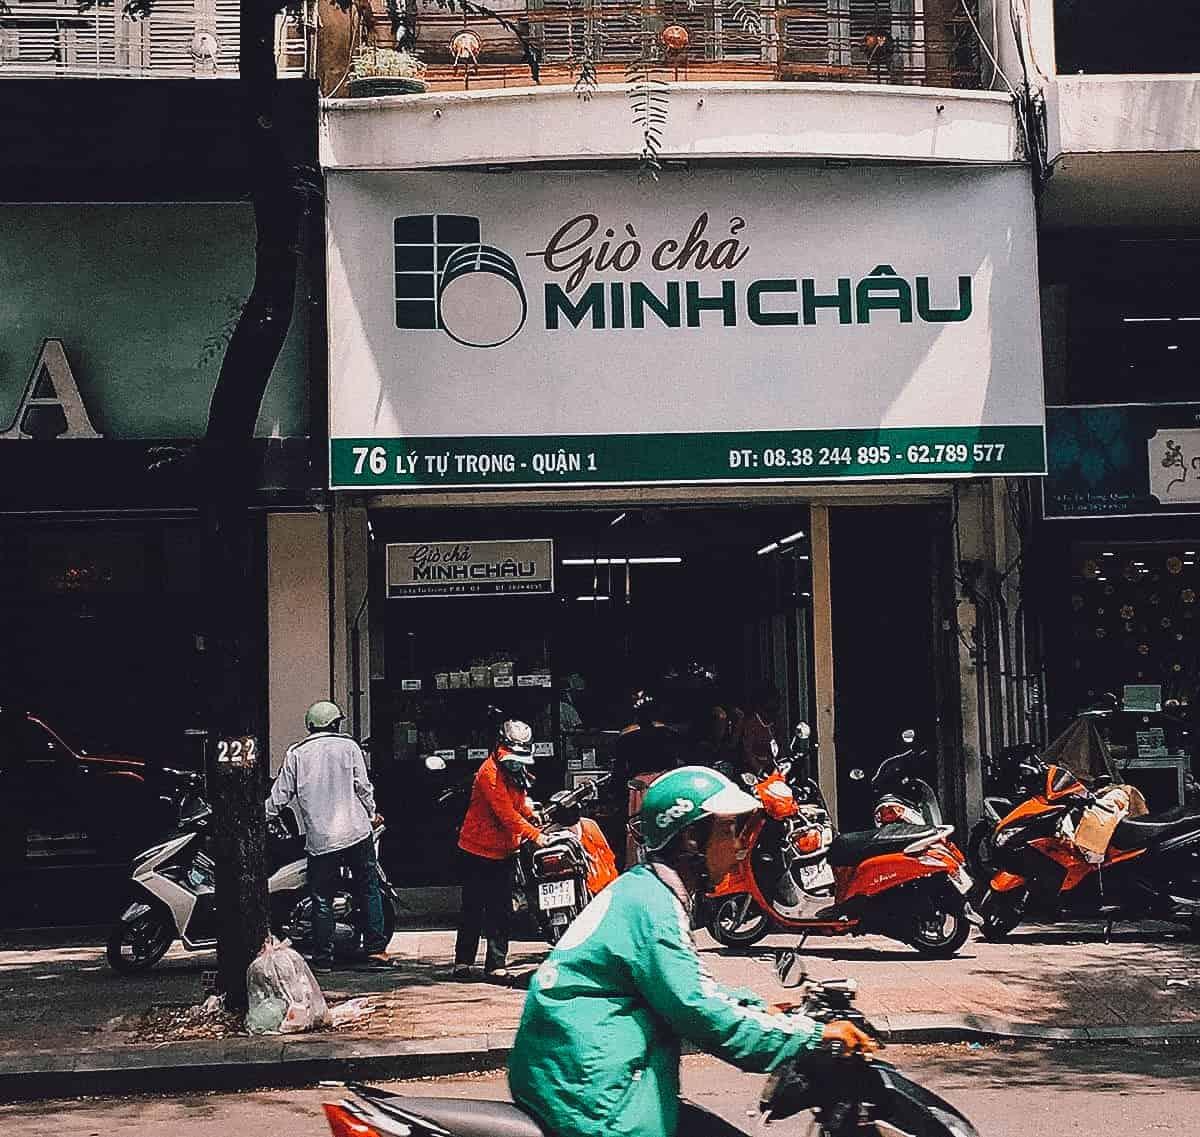 Minh Chau exterior